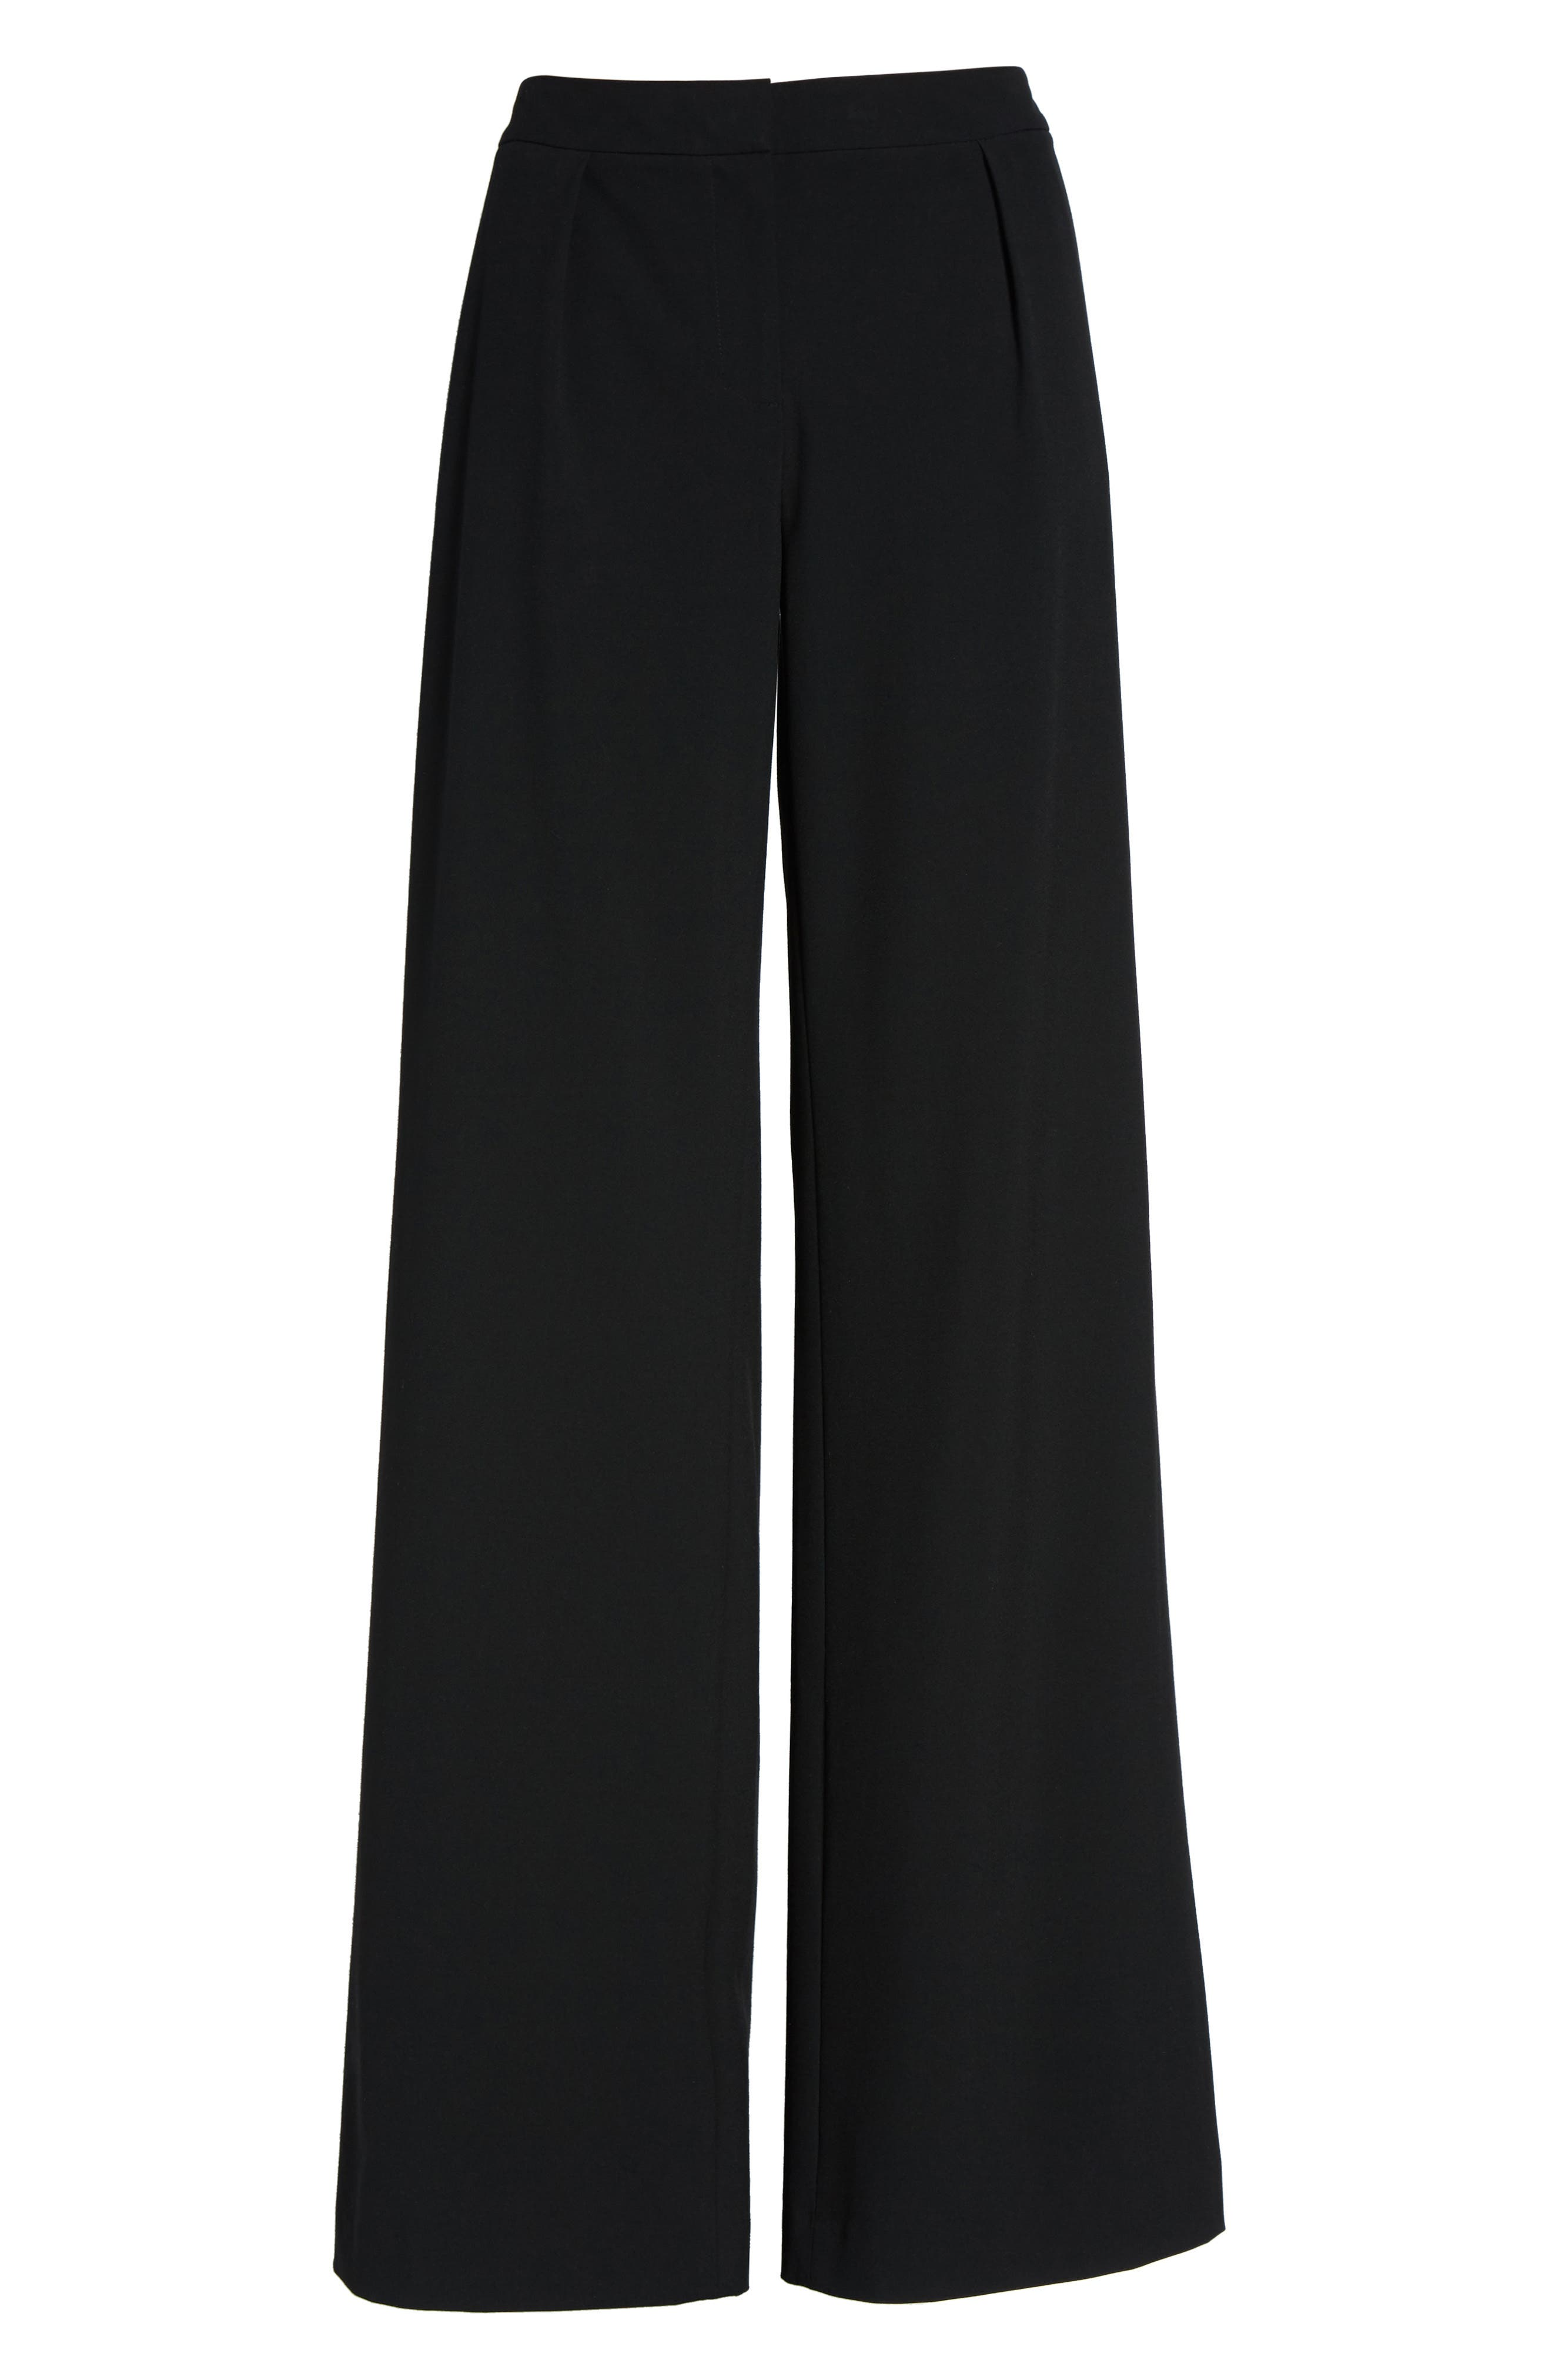 High Waist Wide Leg Pants,                             Alternate thumbnail 6, color,                             Black